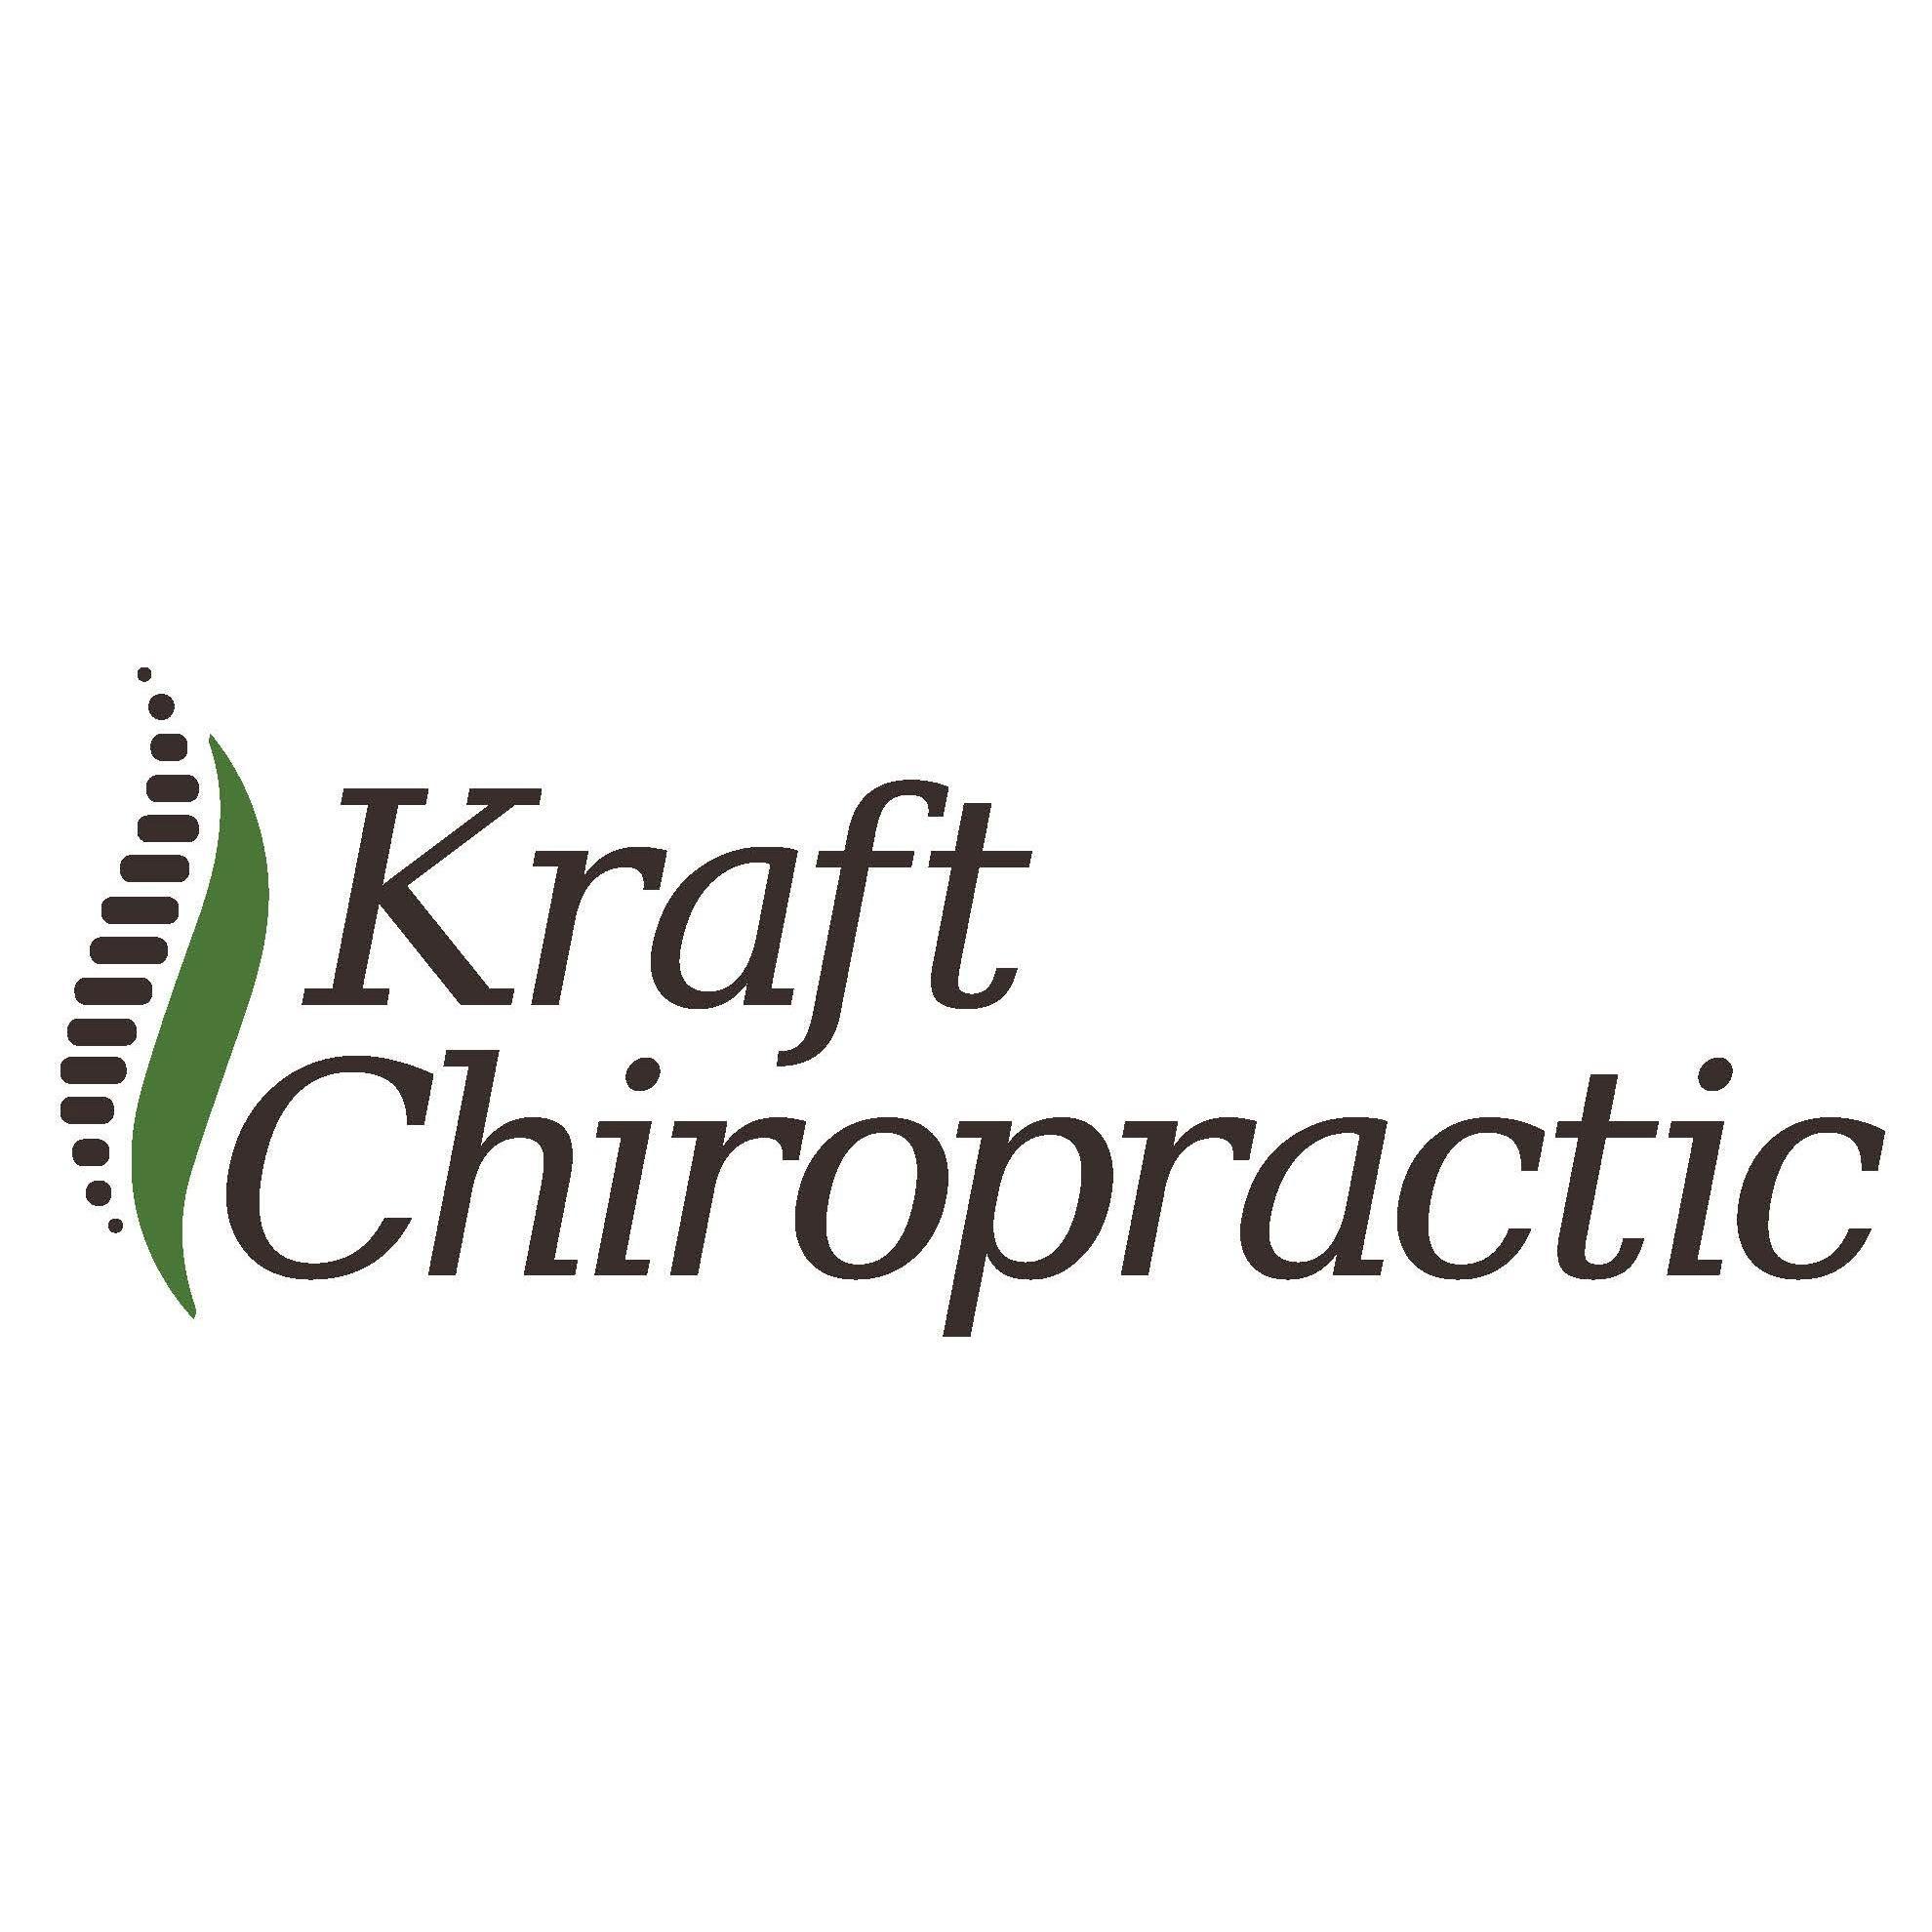 Kraft Chiropractic